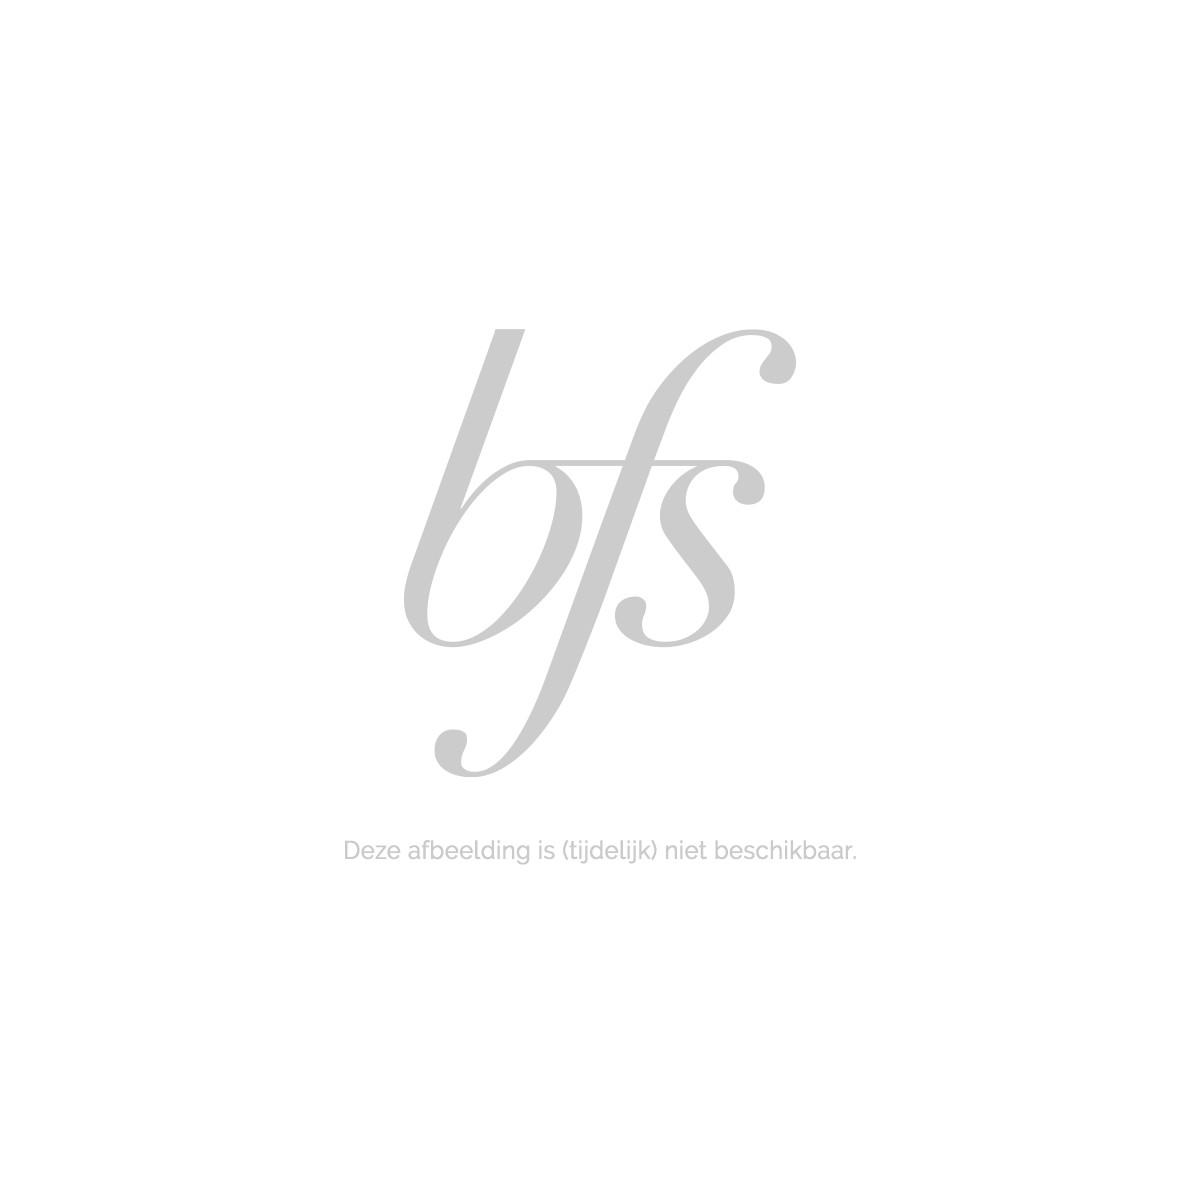 Susan Posnick Refill Brush On Block Spf 30